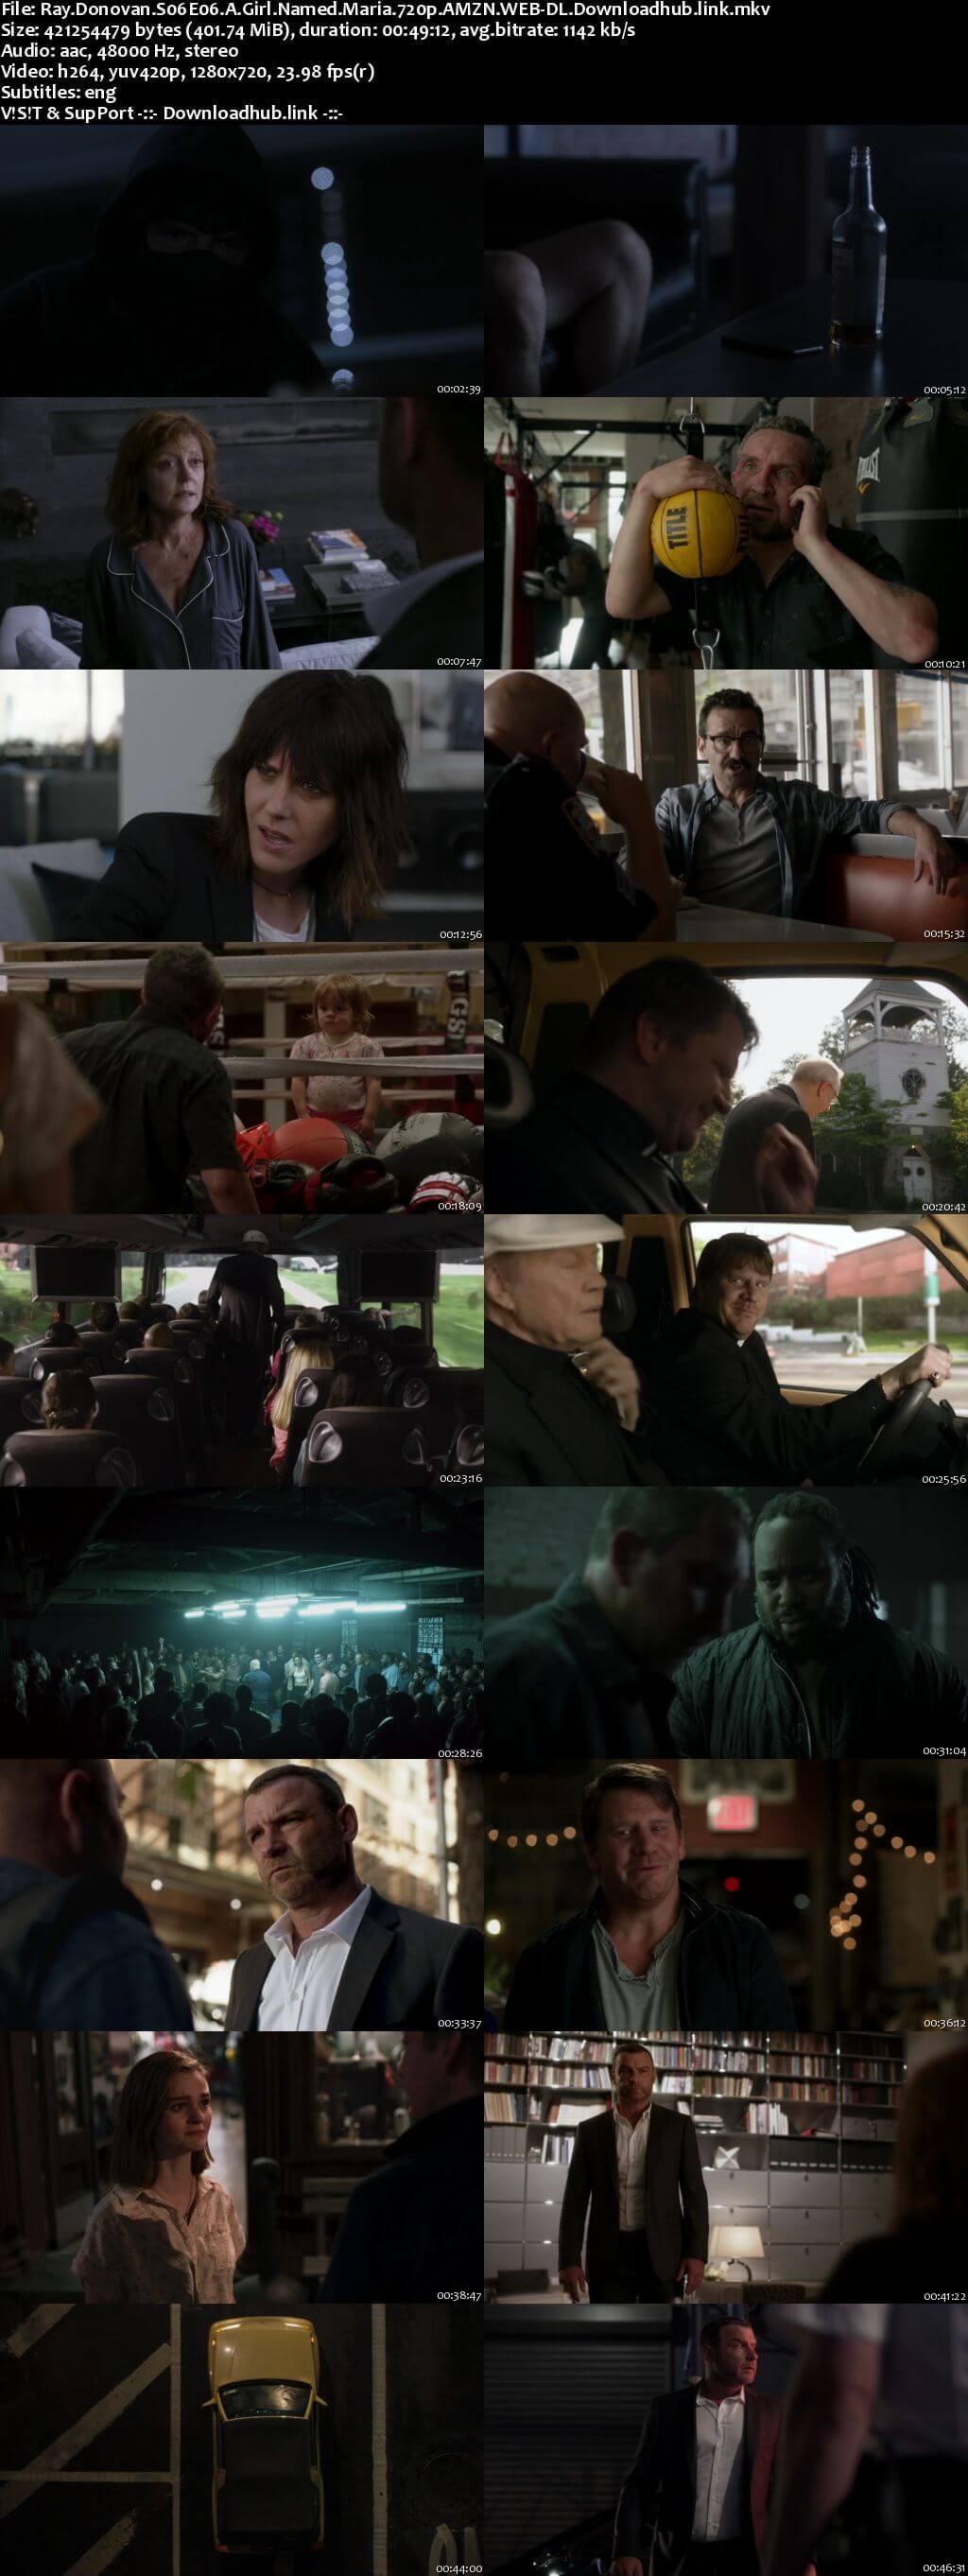 Ray Donovan S06E06 400MB AMZN WEB-DL 720p ESubs